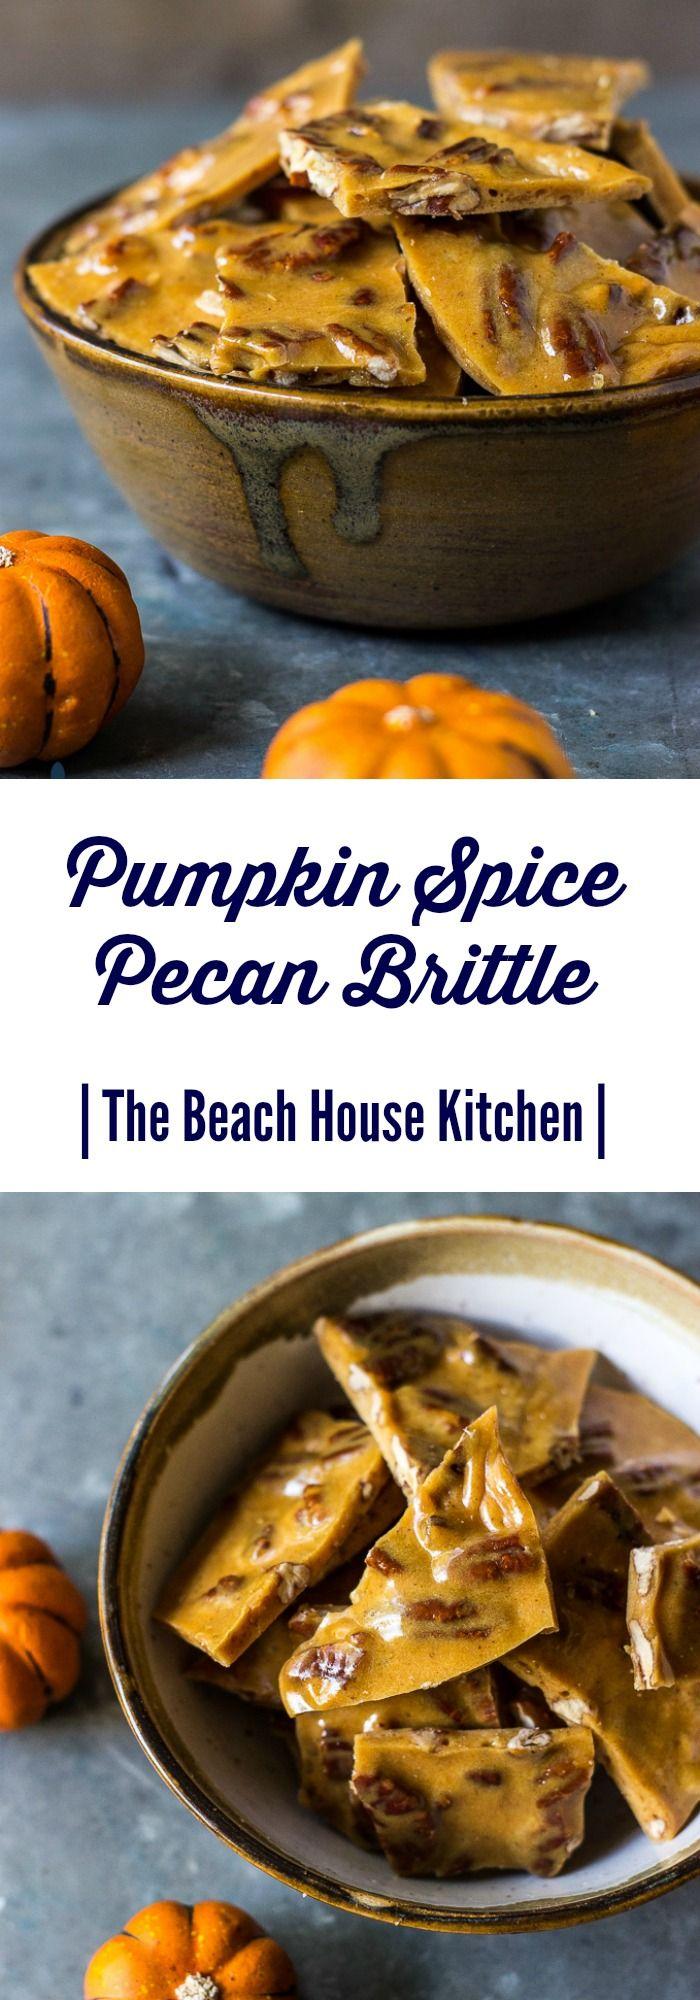 Pumpkin Spice Pecan Brittle | The Beach House Kitchen                                                                                                                                                                                 More